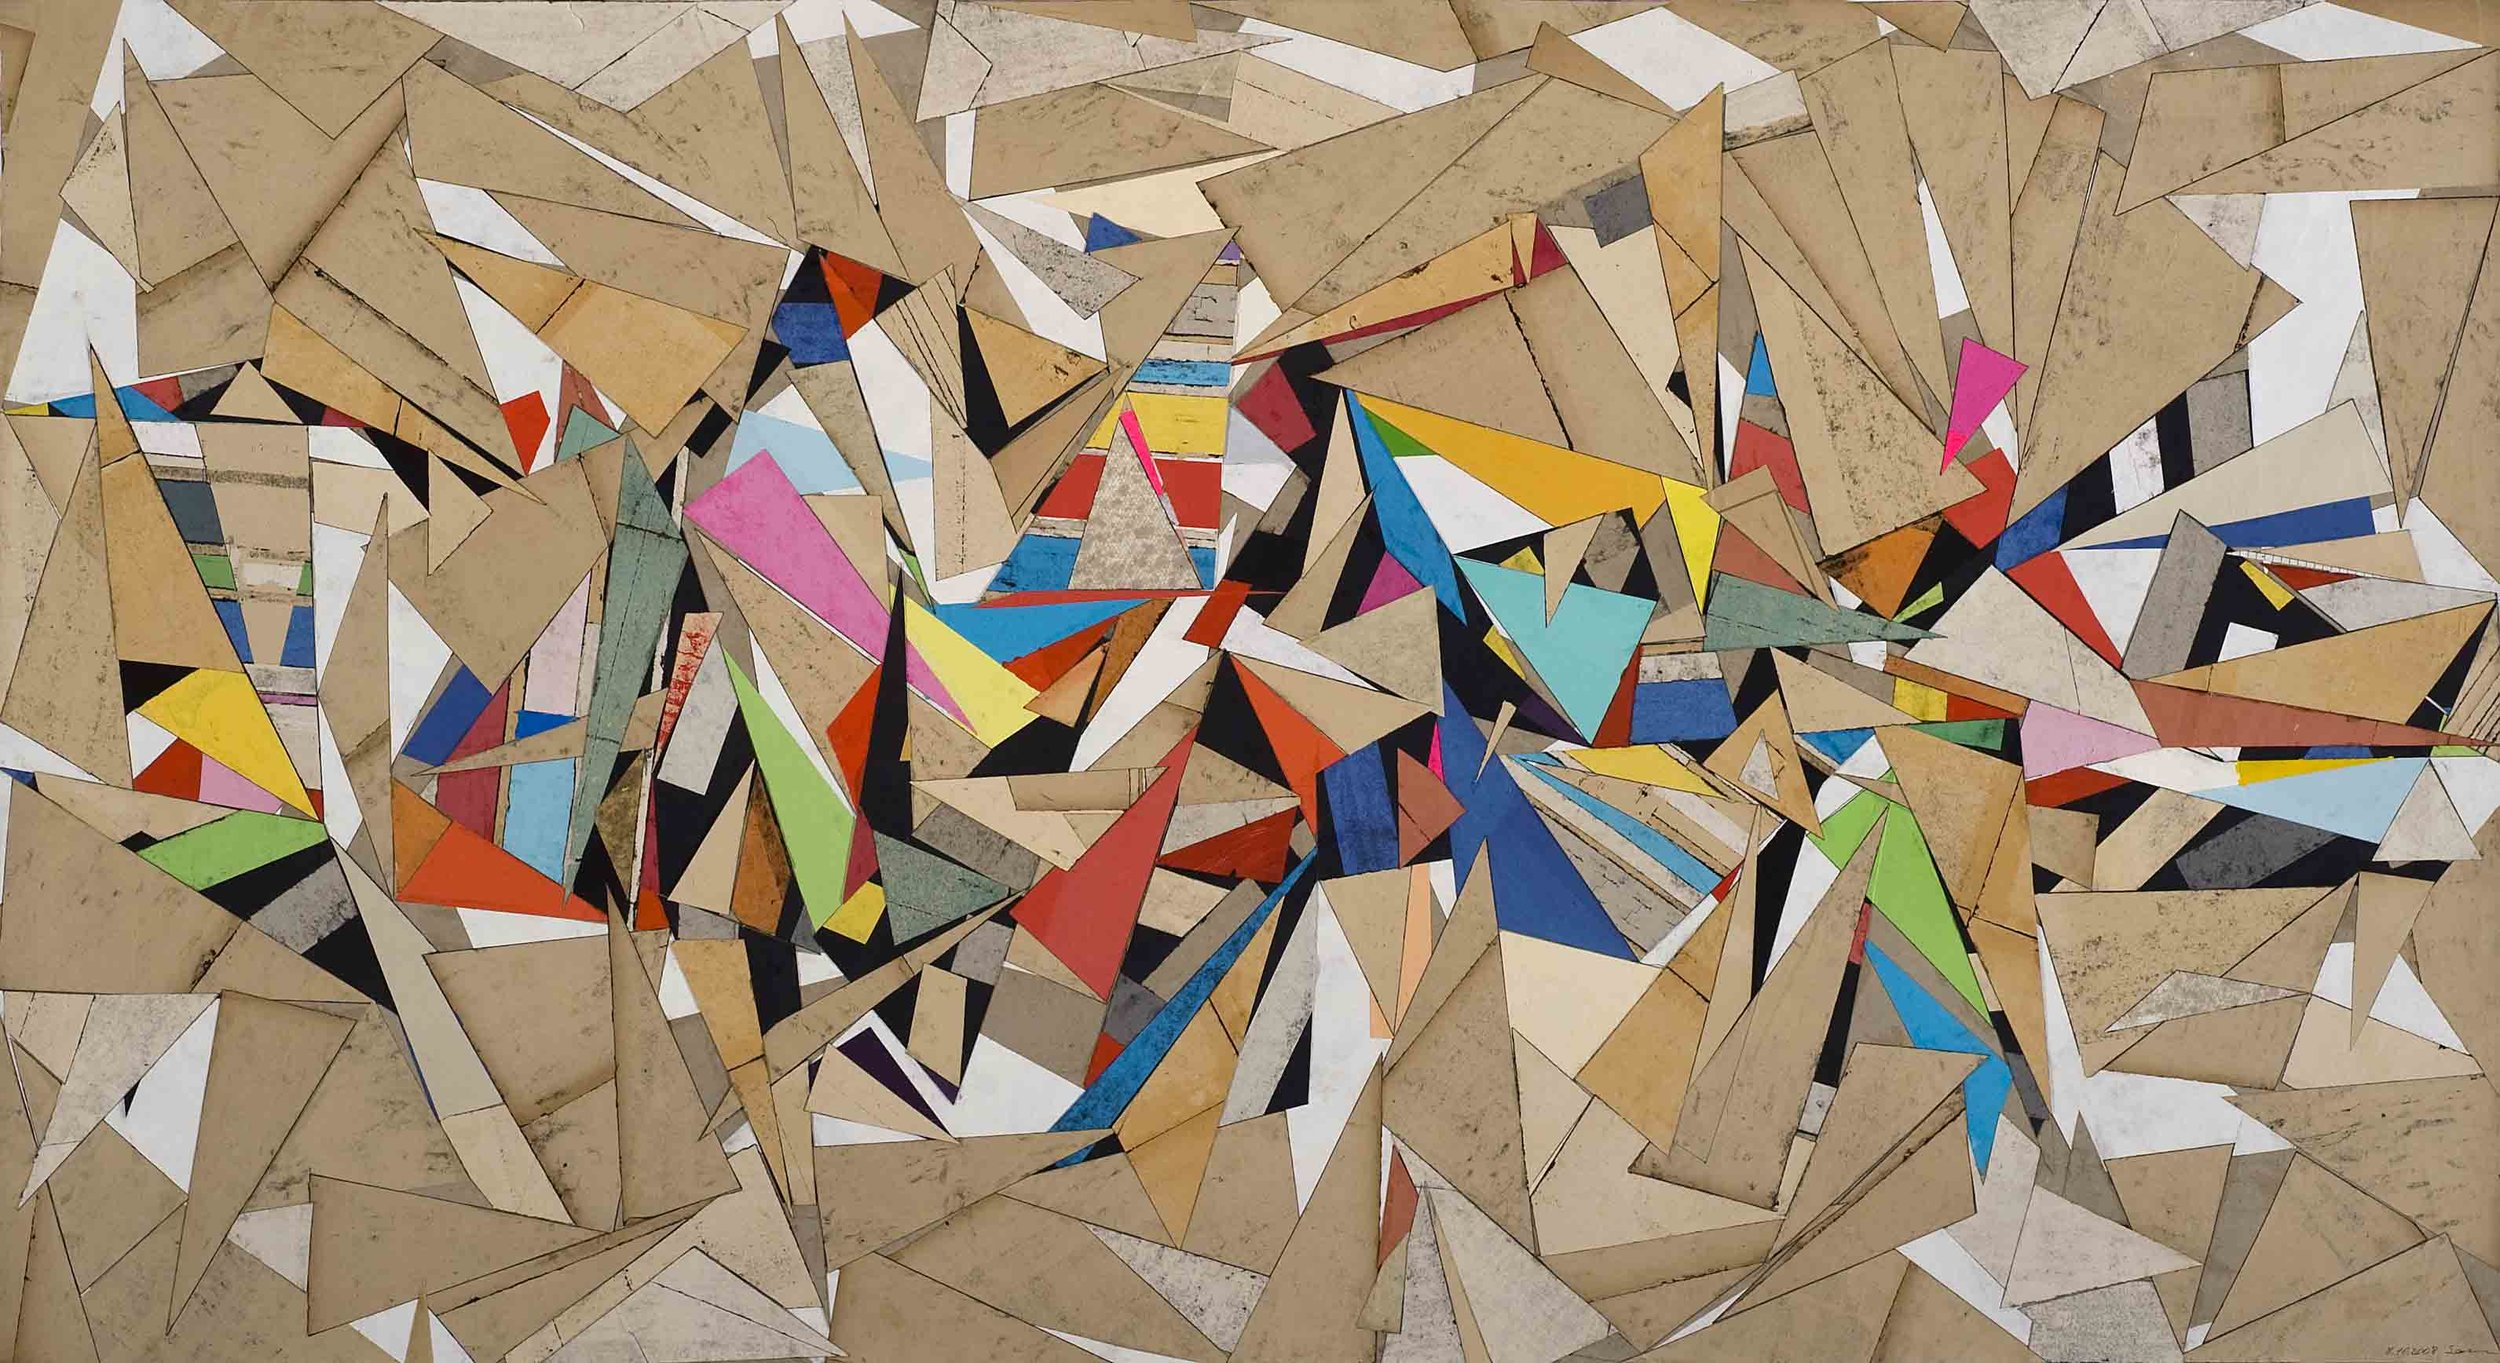 Sam Grigorian, Untitled , 2012, mixed media, decollage, 80 x 147cm